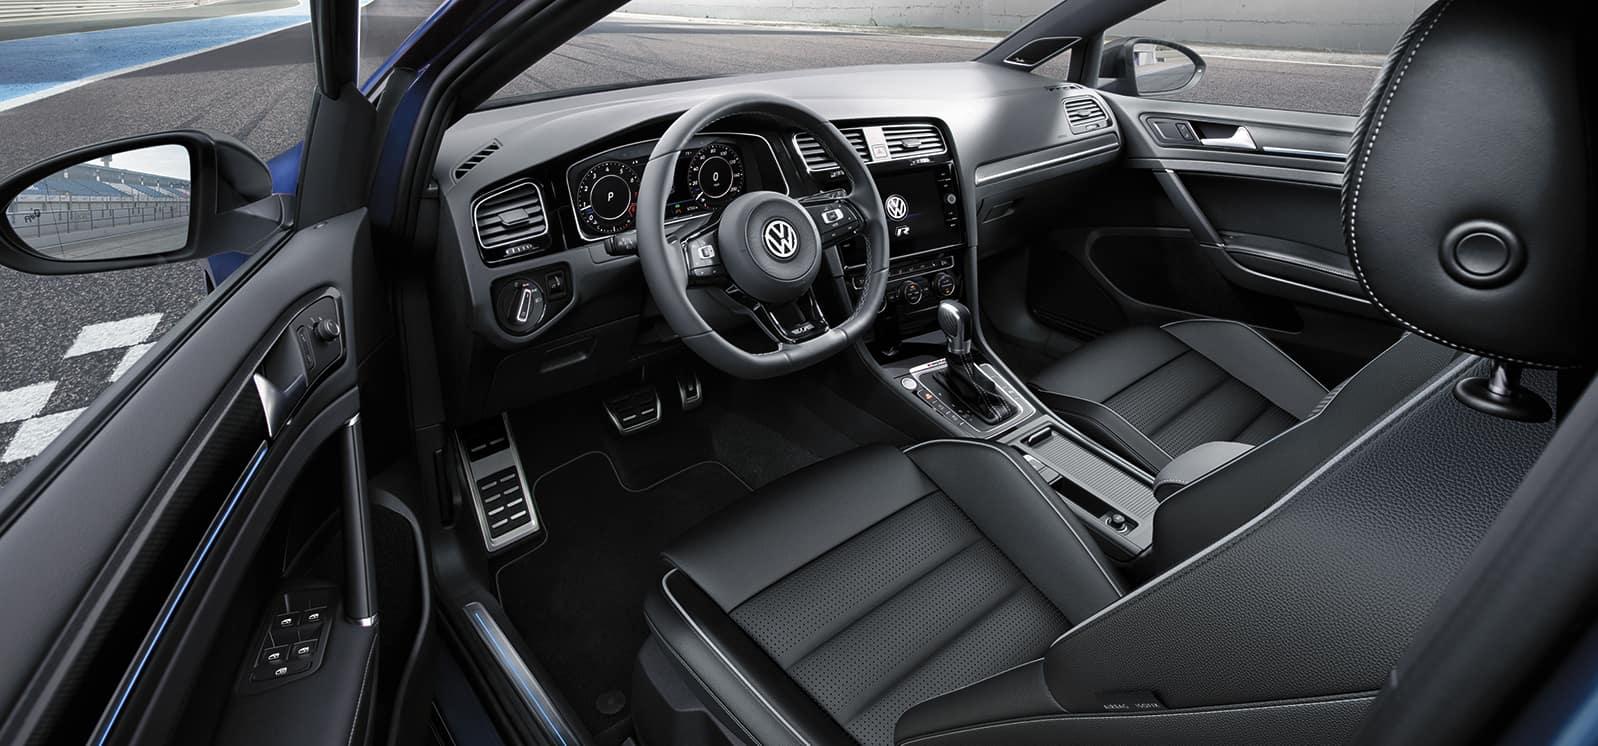 Hanover Volkswagen is a Car Dealership in Hanover PA near Finksburg MD | 2019 VW Golf interior